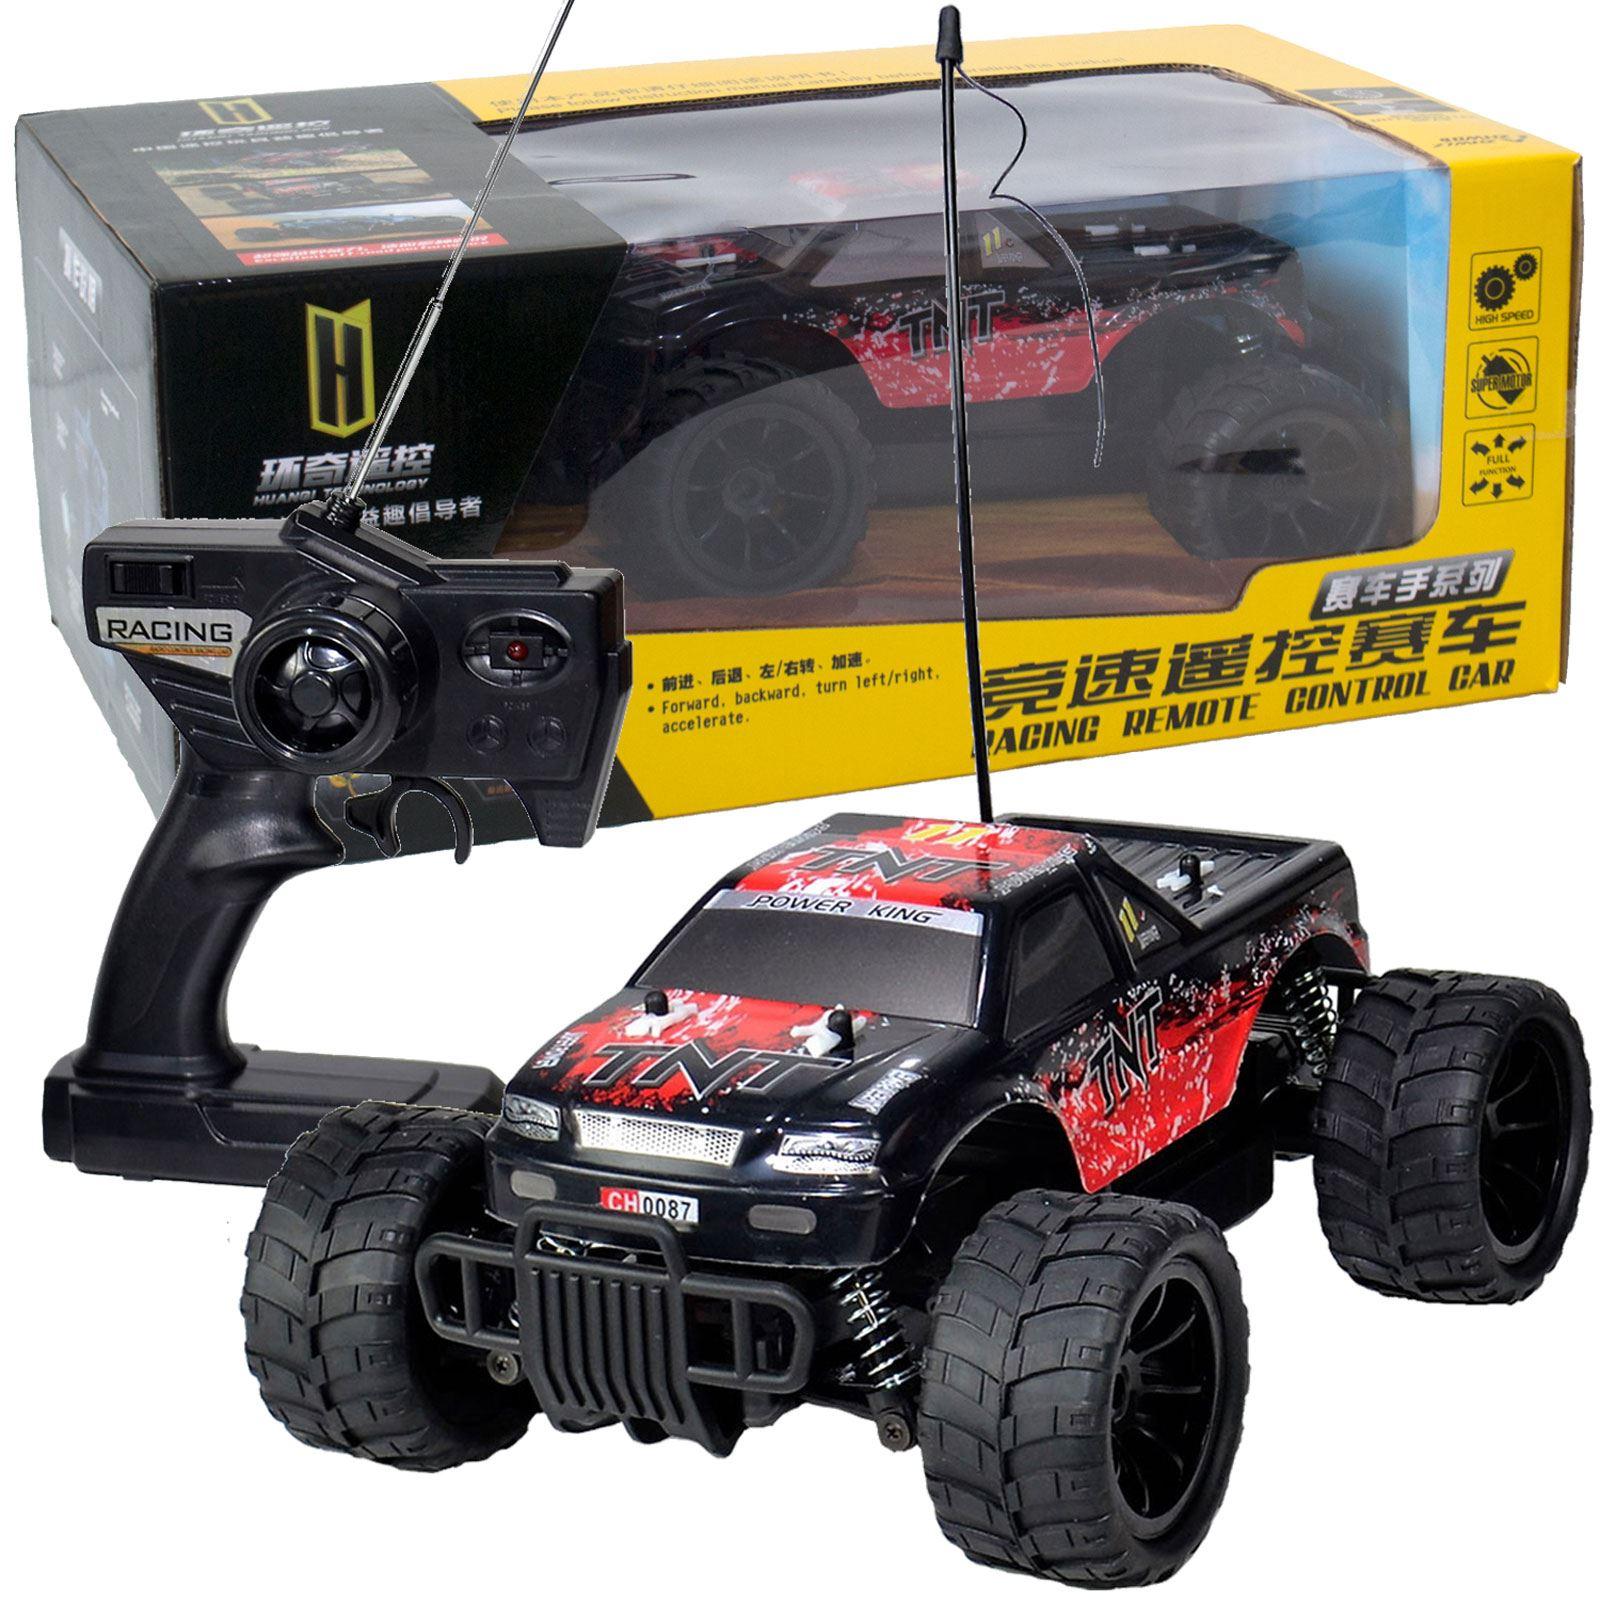 1:16 Radio Remote Control Off Road RC Cars Racing Buggy ...